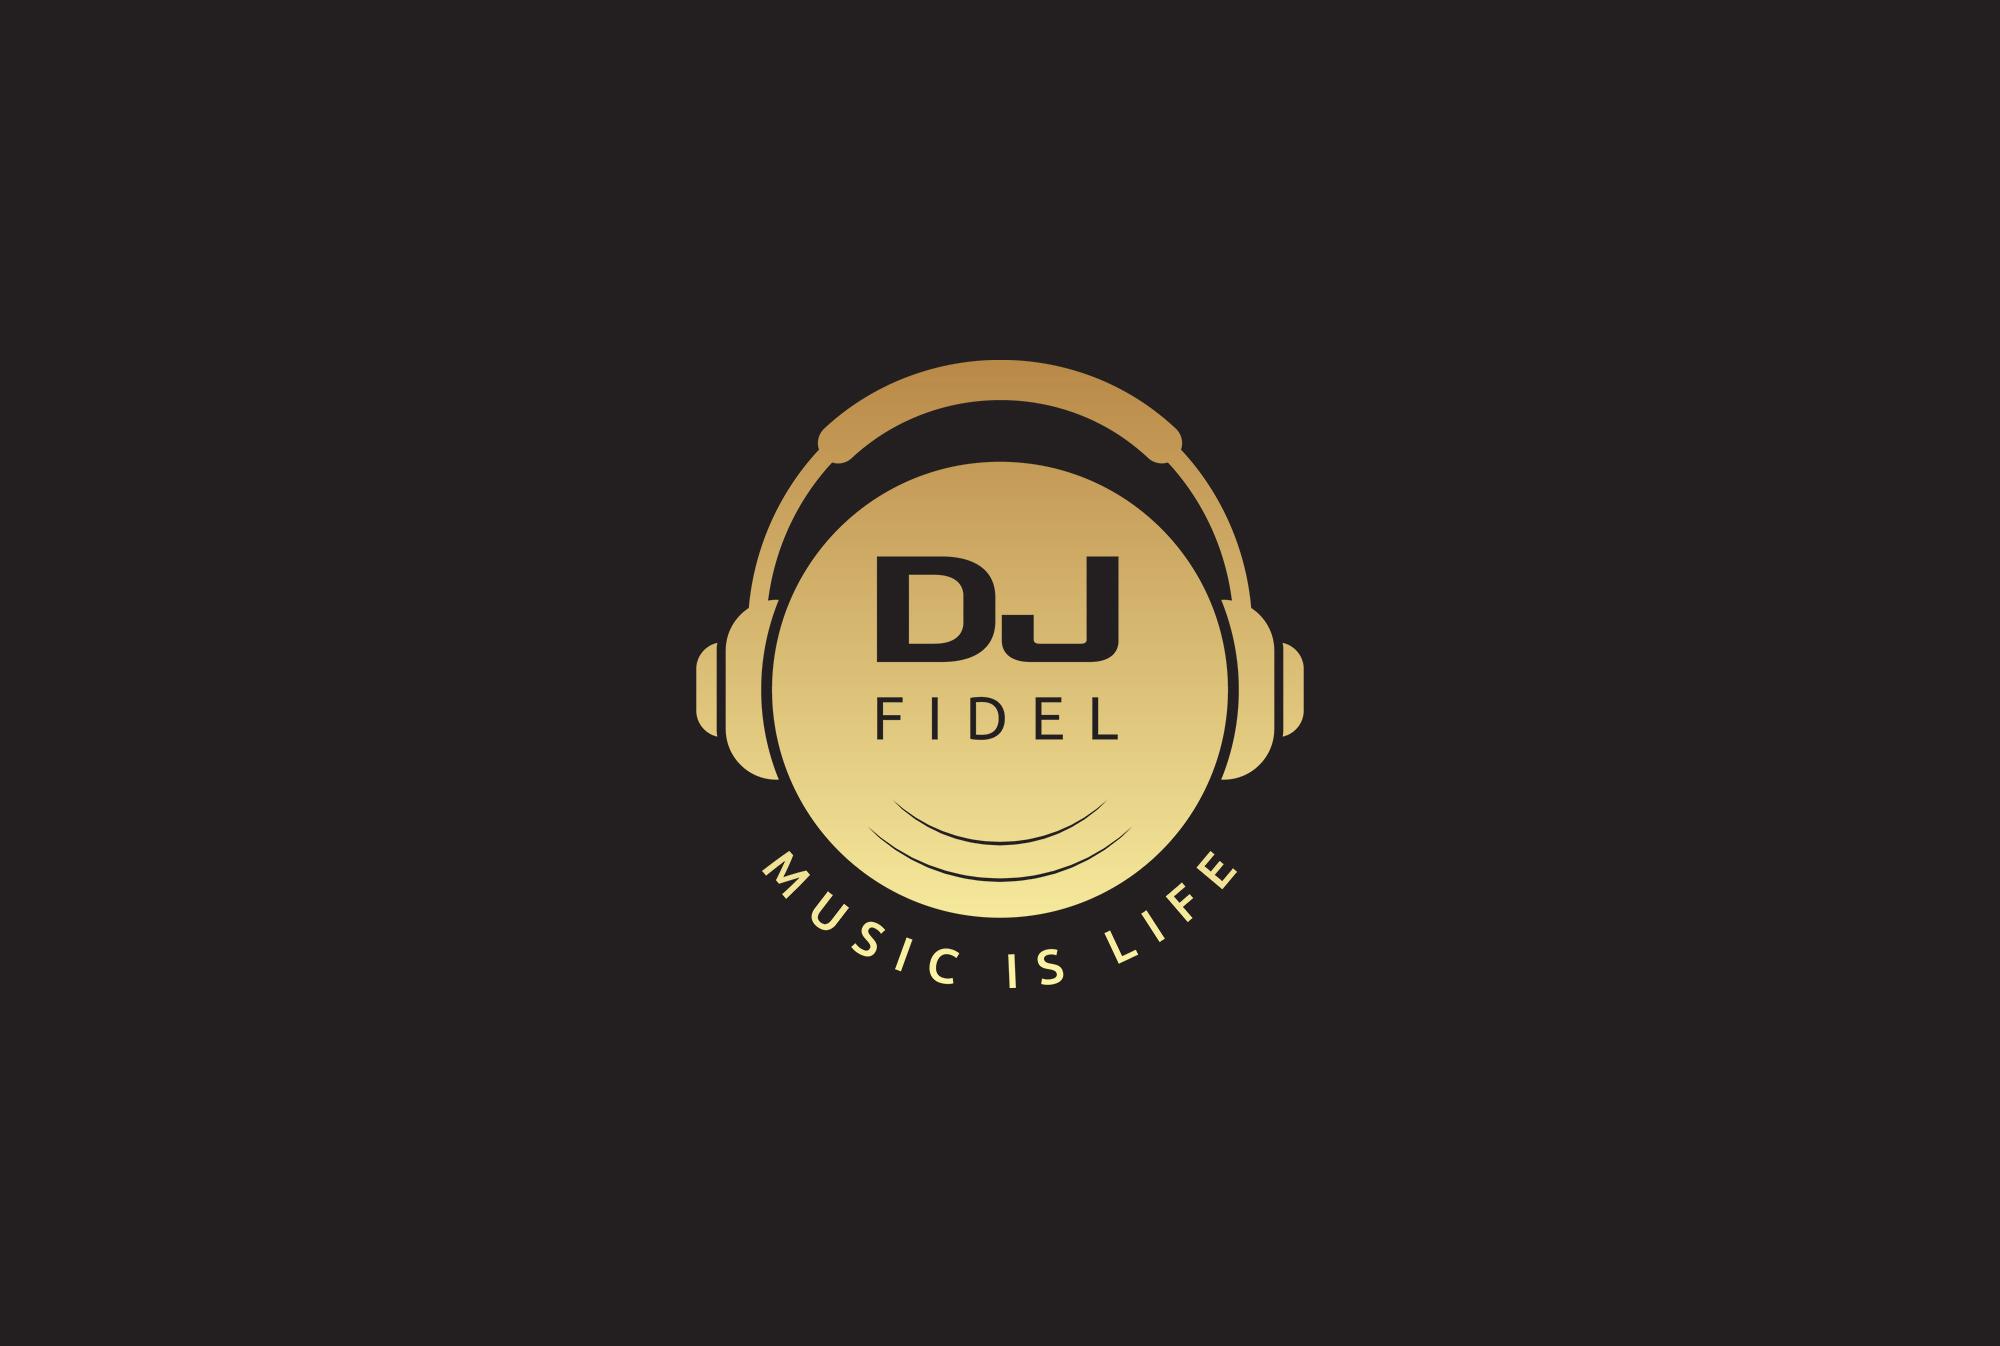 DJ-Fidel-Logo-A3 Mock-up